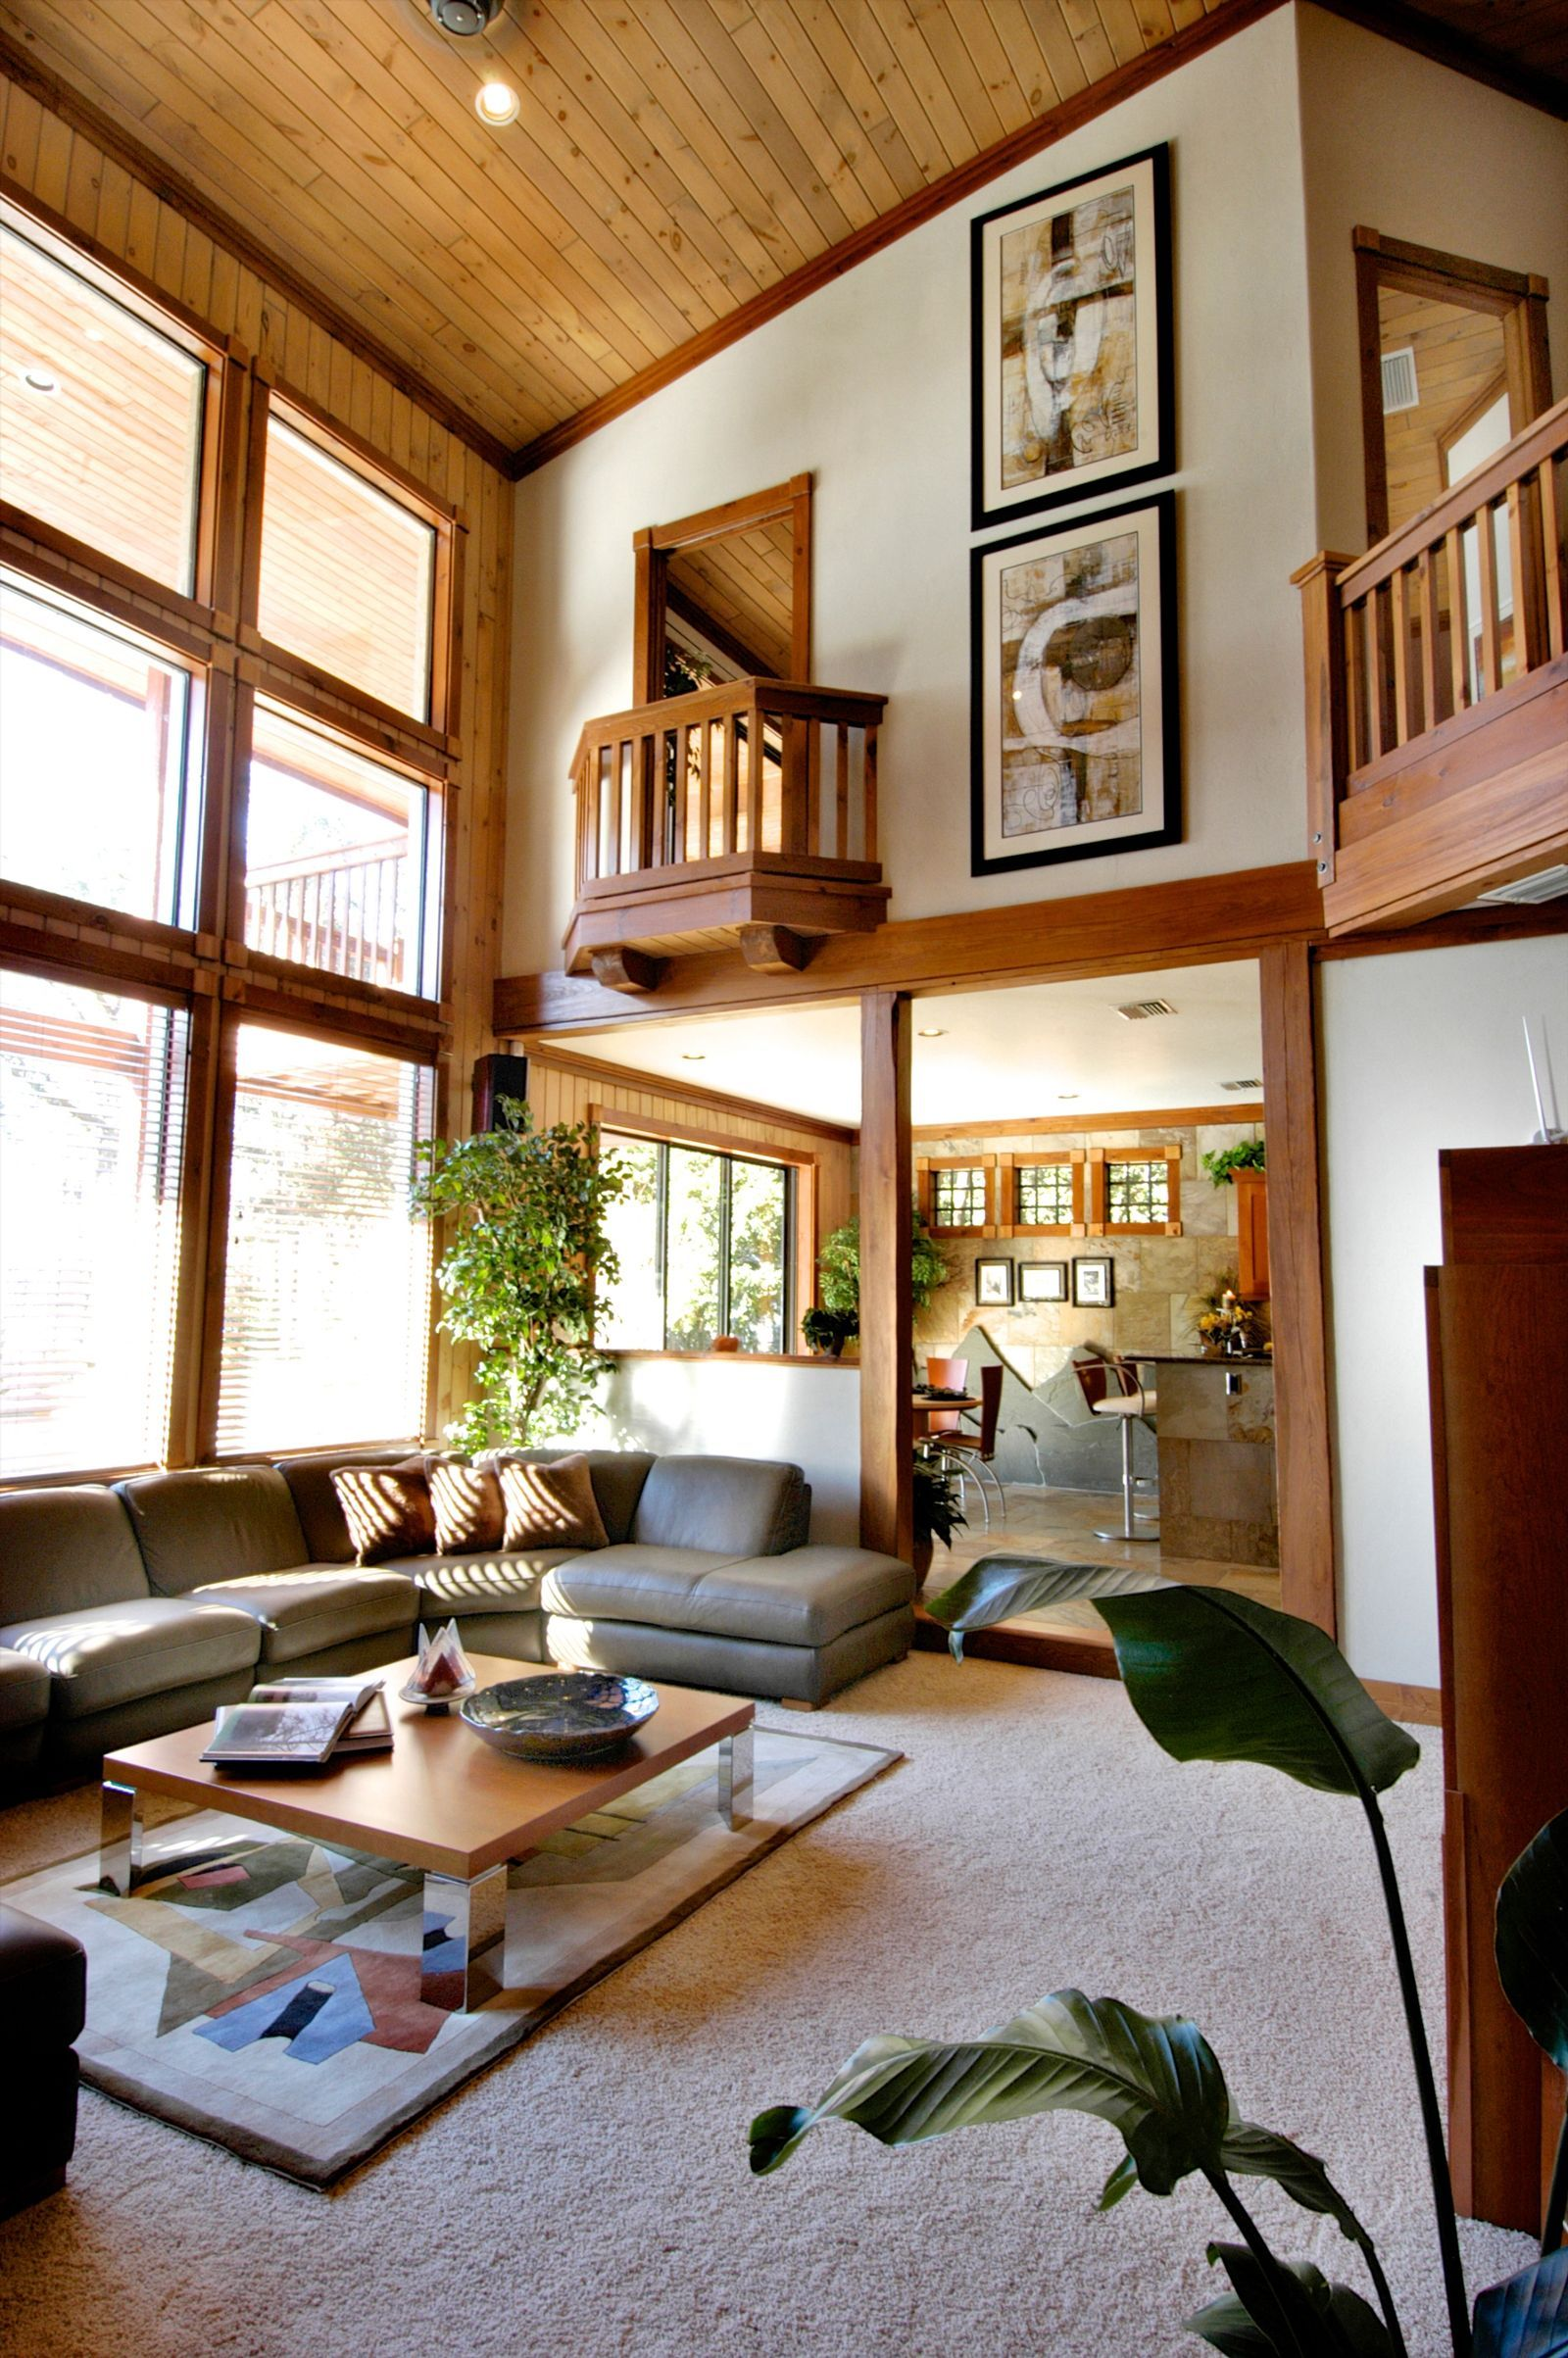 Juliet Balcony Overlooking A 2 Story Living Room